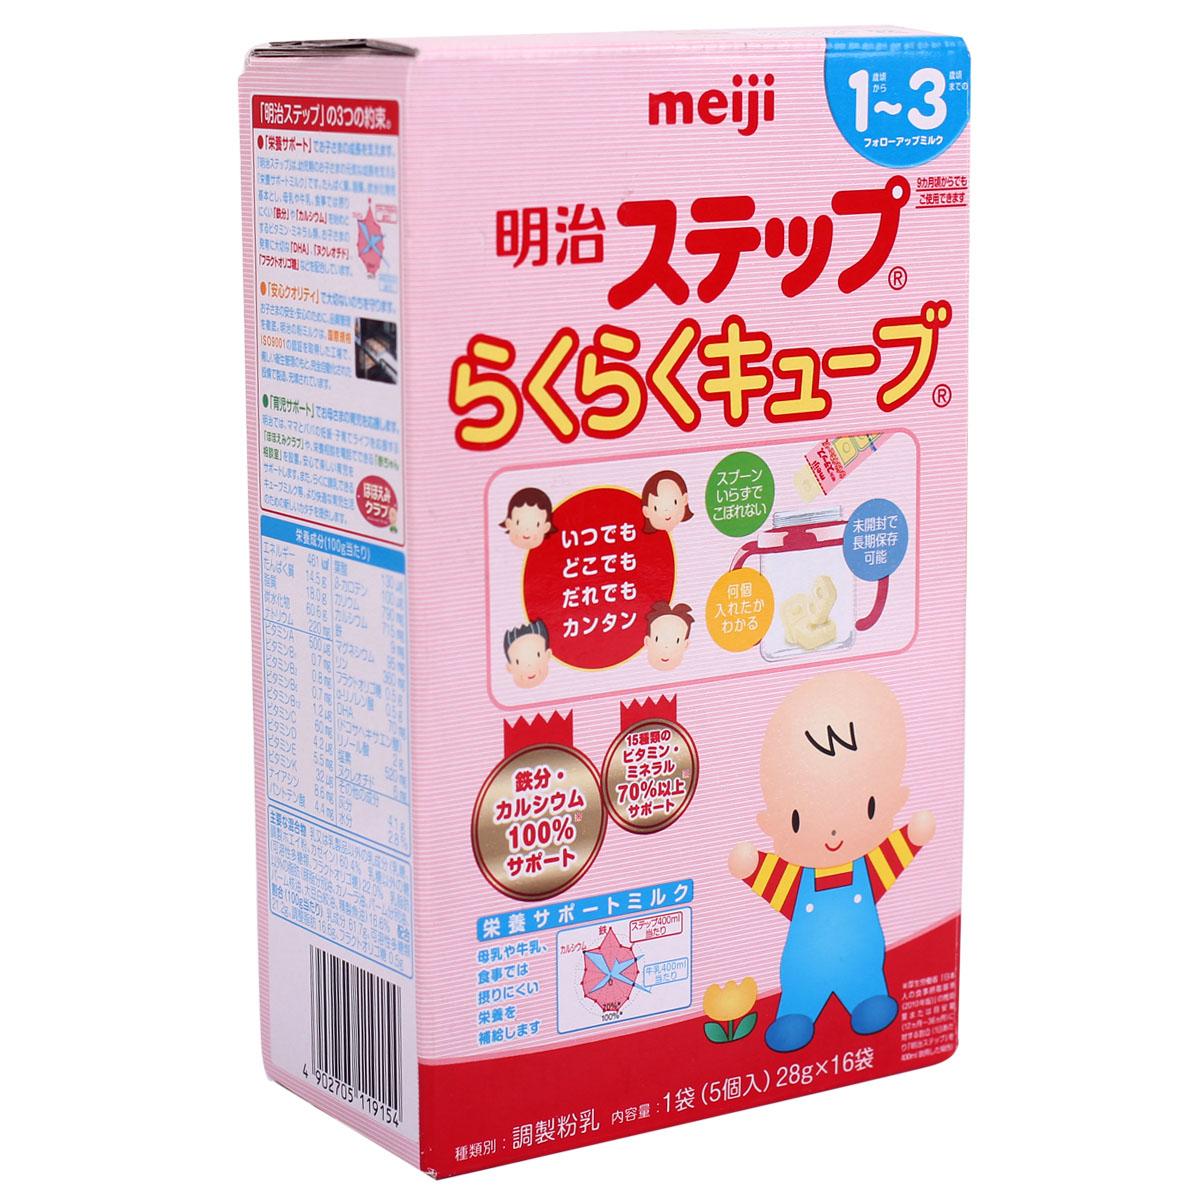 Sua Meiji so 9 Nhat Ban dang thanh (16 thanh)